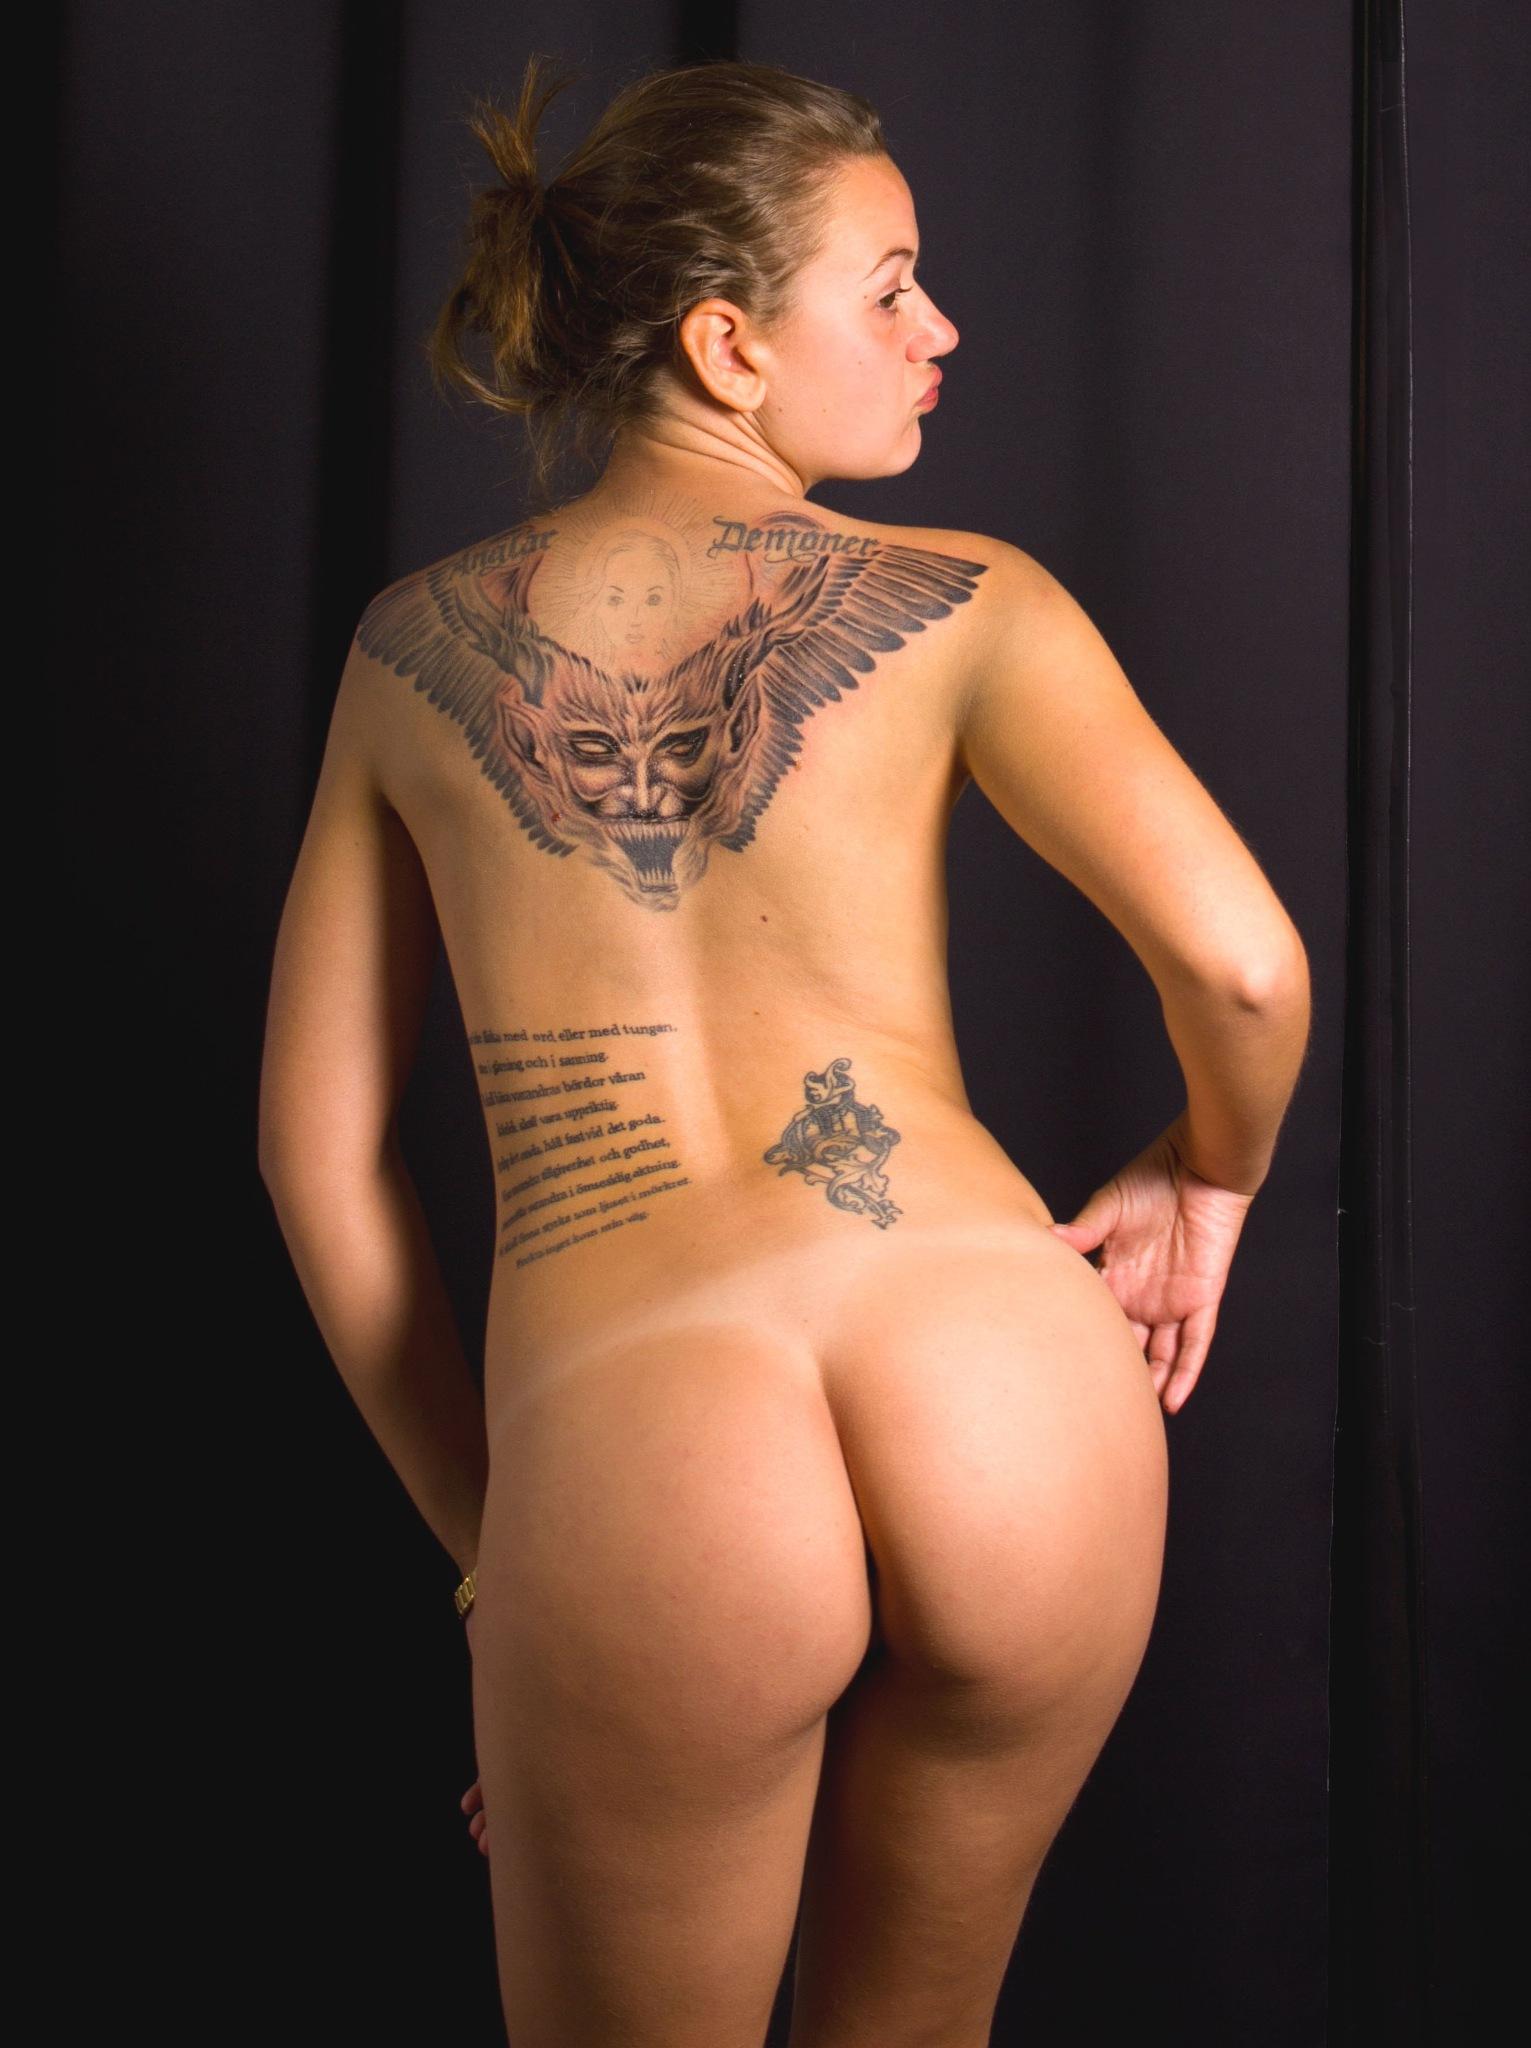 Tattooed Girl by Swe Bodyart